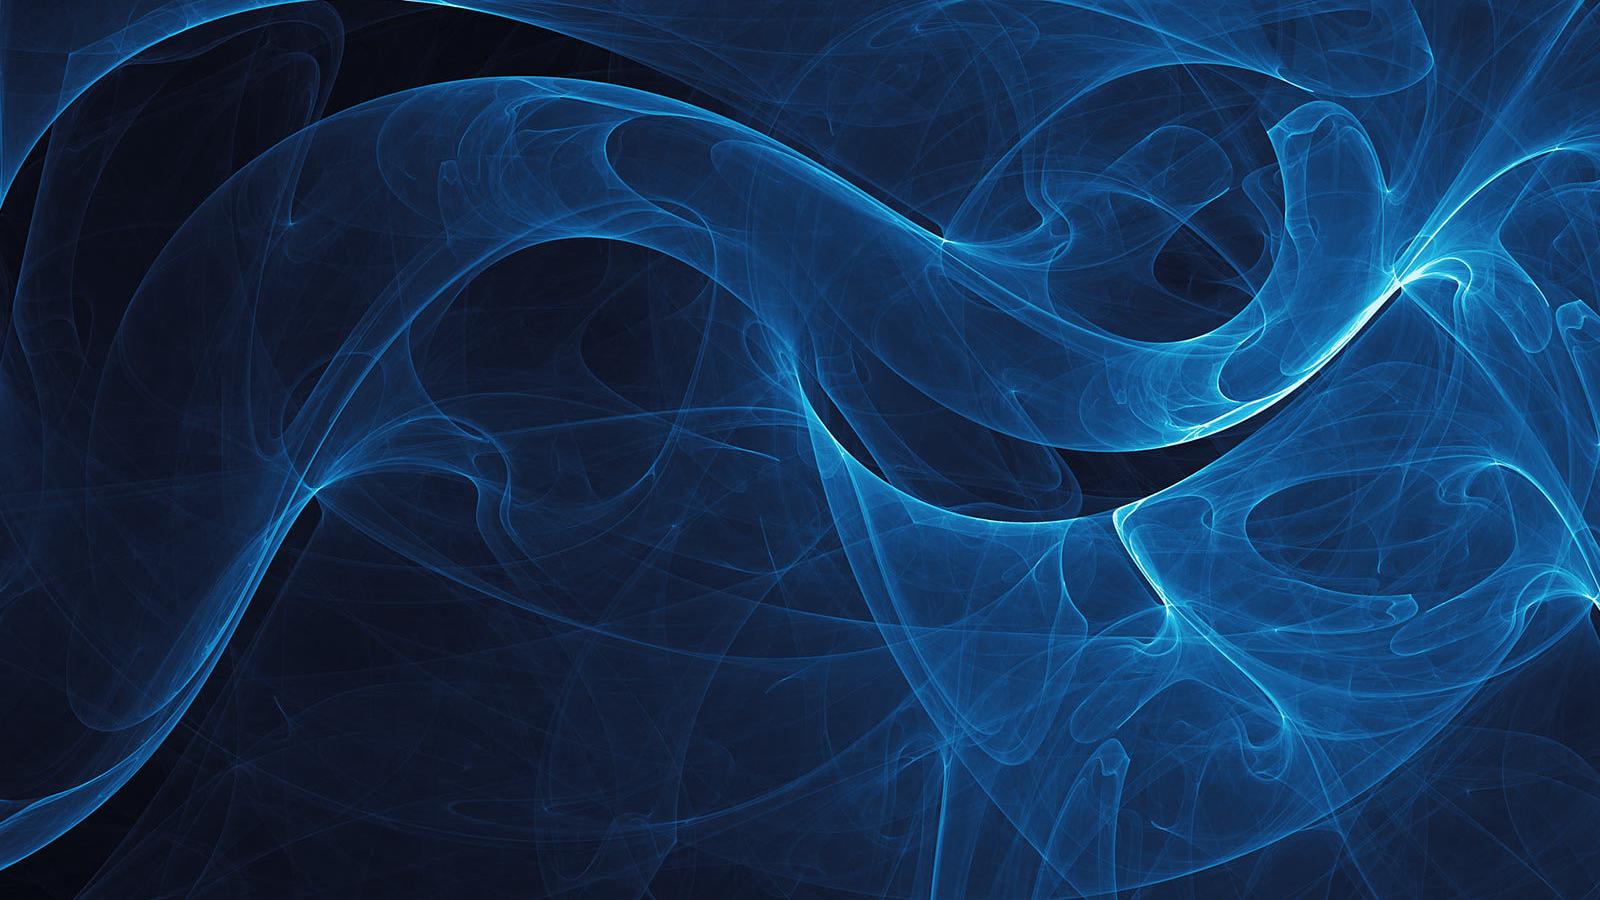 Free Download Blue Wallpaper Blue Wallpaper Designs Cool Blue Wallpapers Light Blue 1600x1200 For Your Desktop Mobile Tablet Explore 50 Blue And Black Backgrounds Wallpapers Blue Wallpaper Background Blue